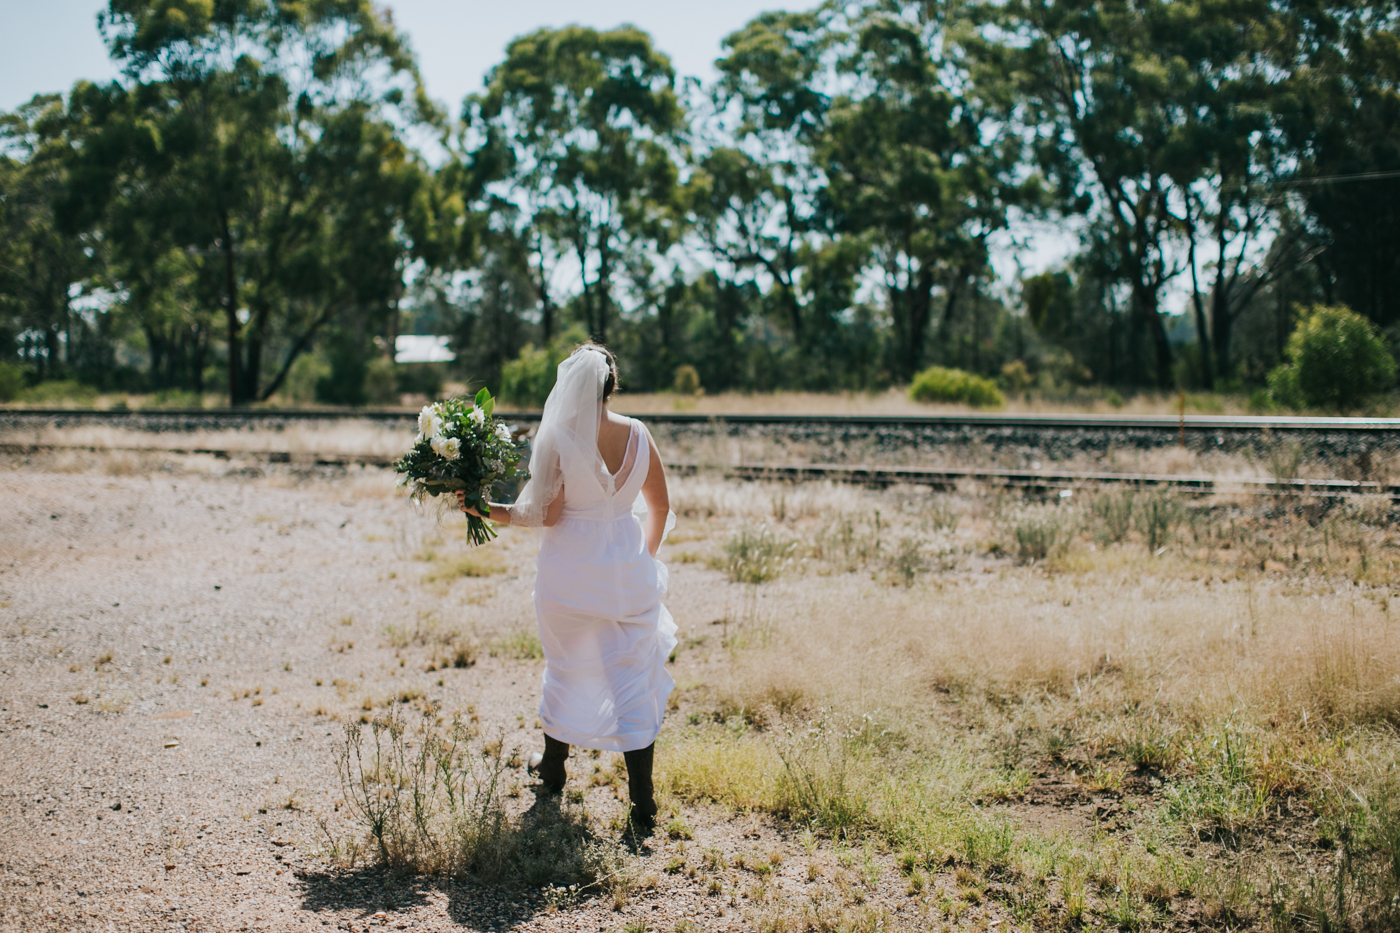 Nicolle & Jacob - Dubbo Wedding - Country Australia - Samantha Heather Photography-129.jpg